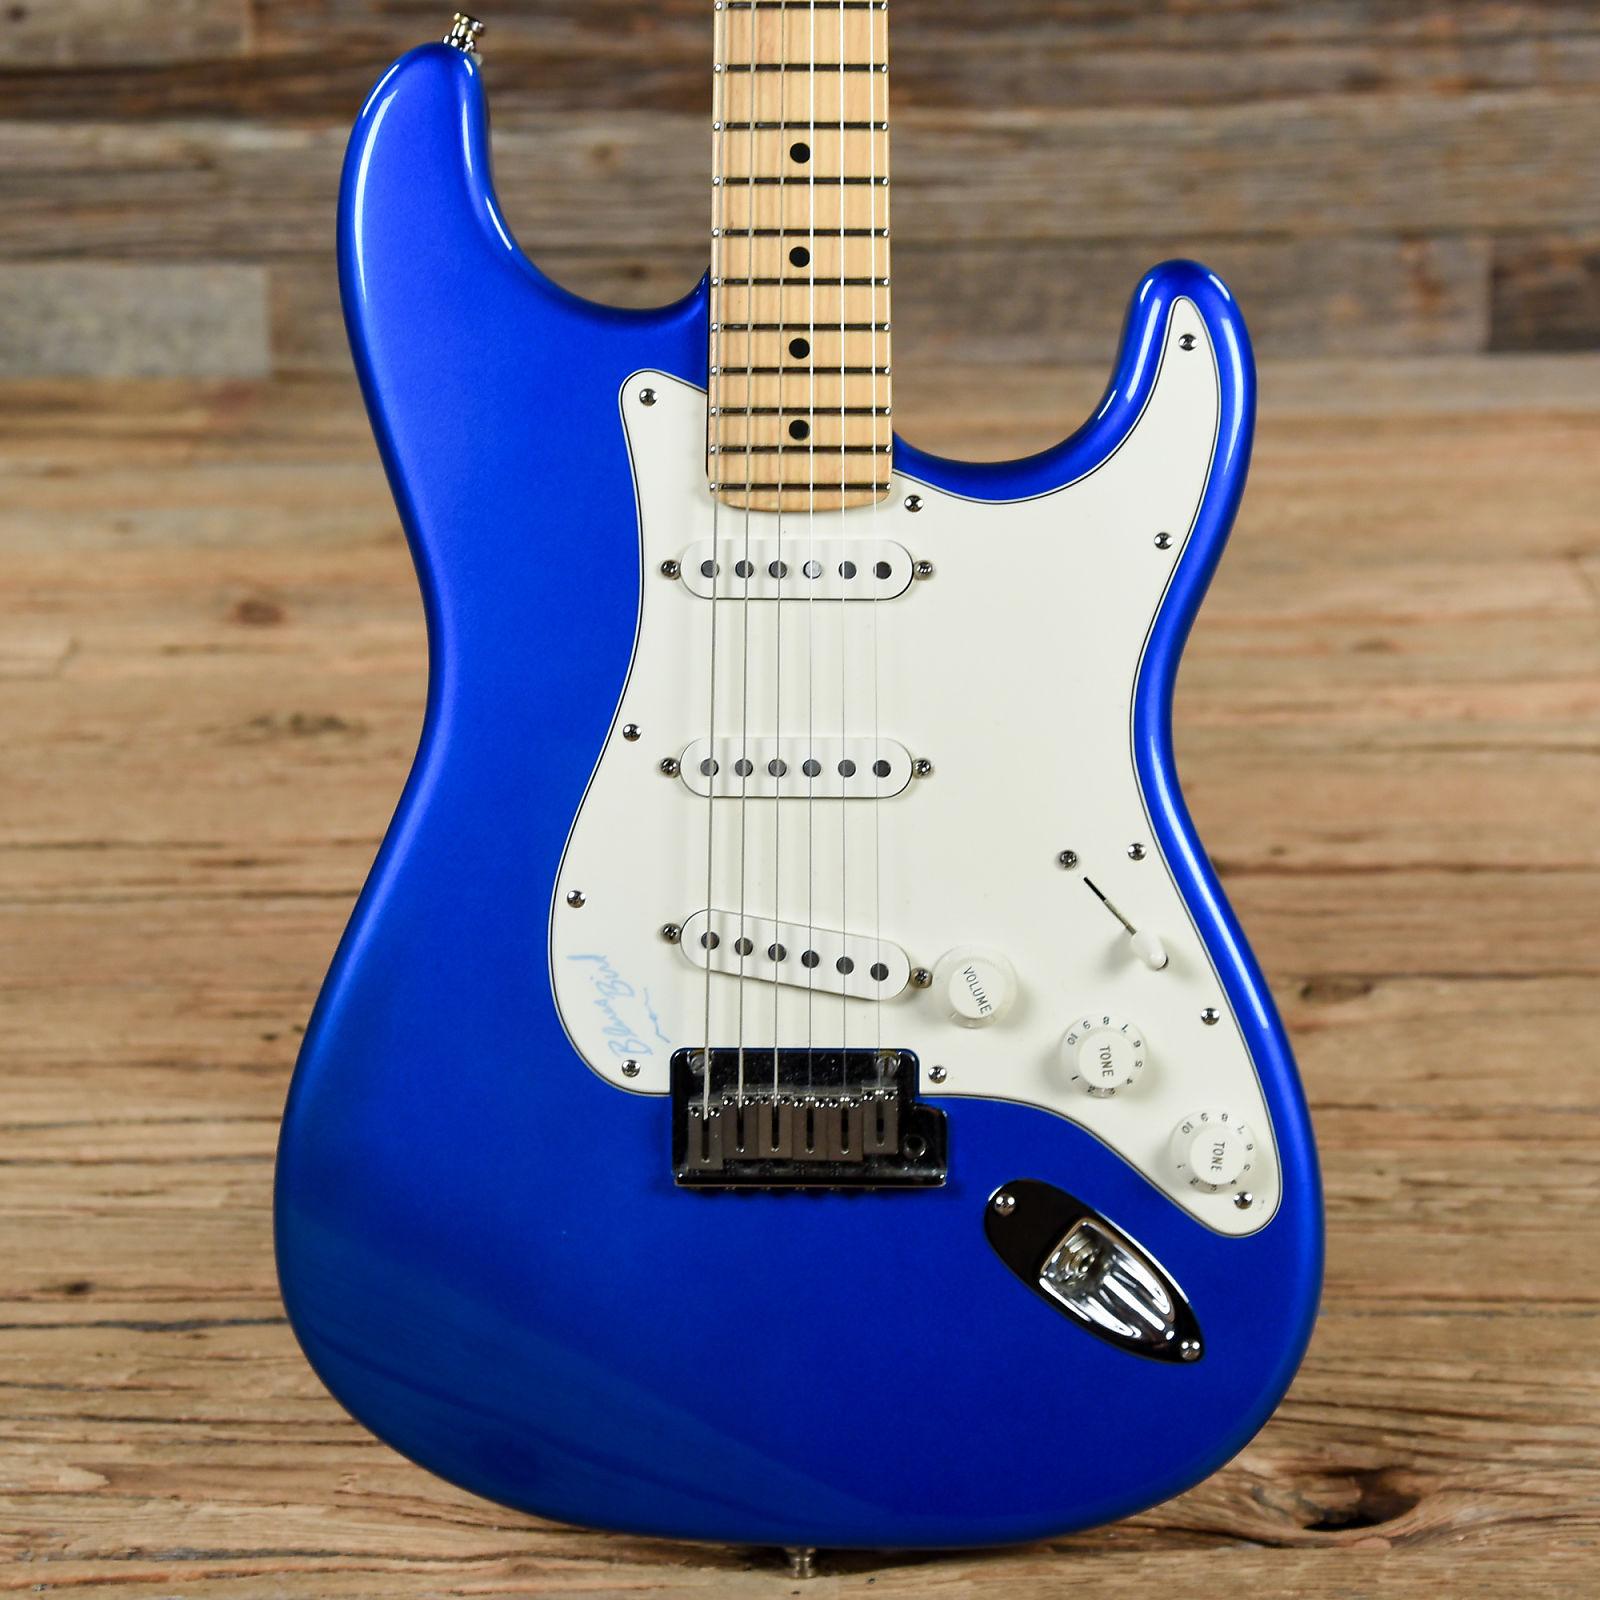 Fender American Standard Stratocaster Metallic Blue 2002 (s945)